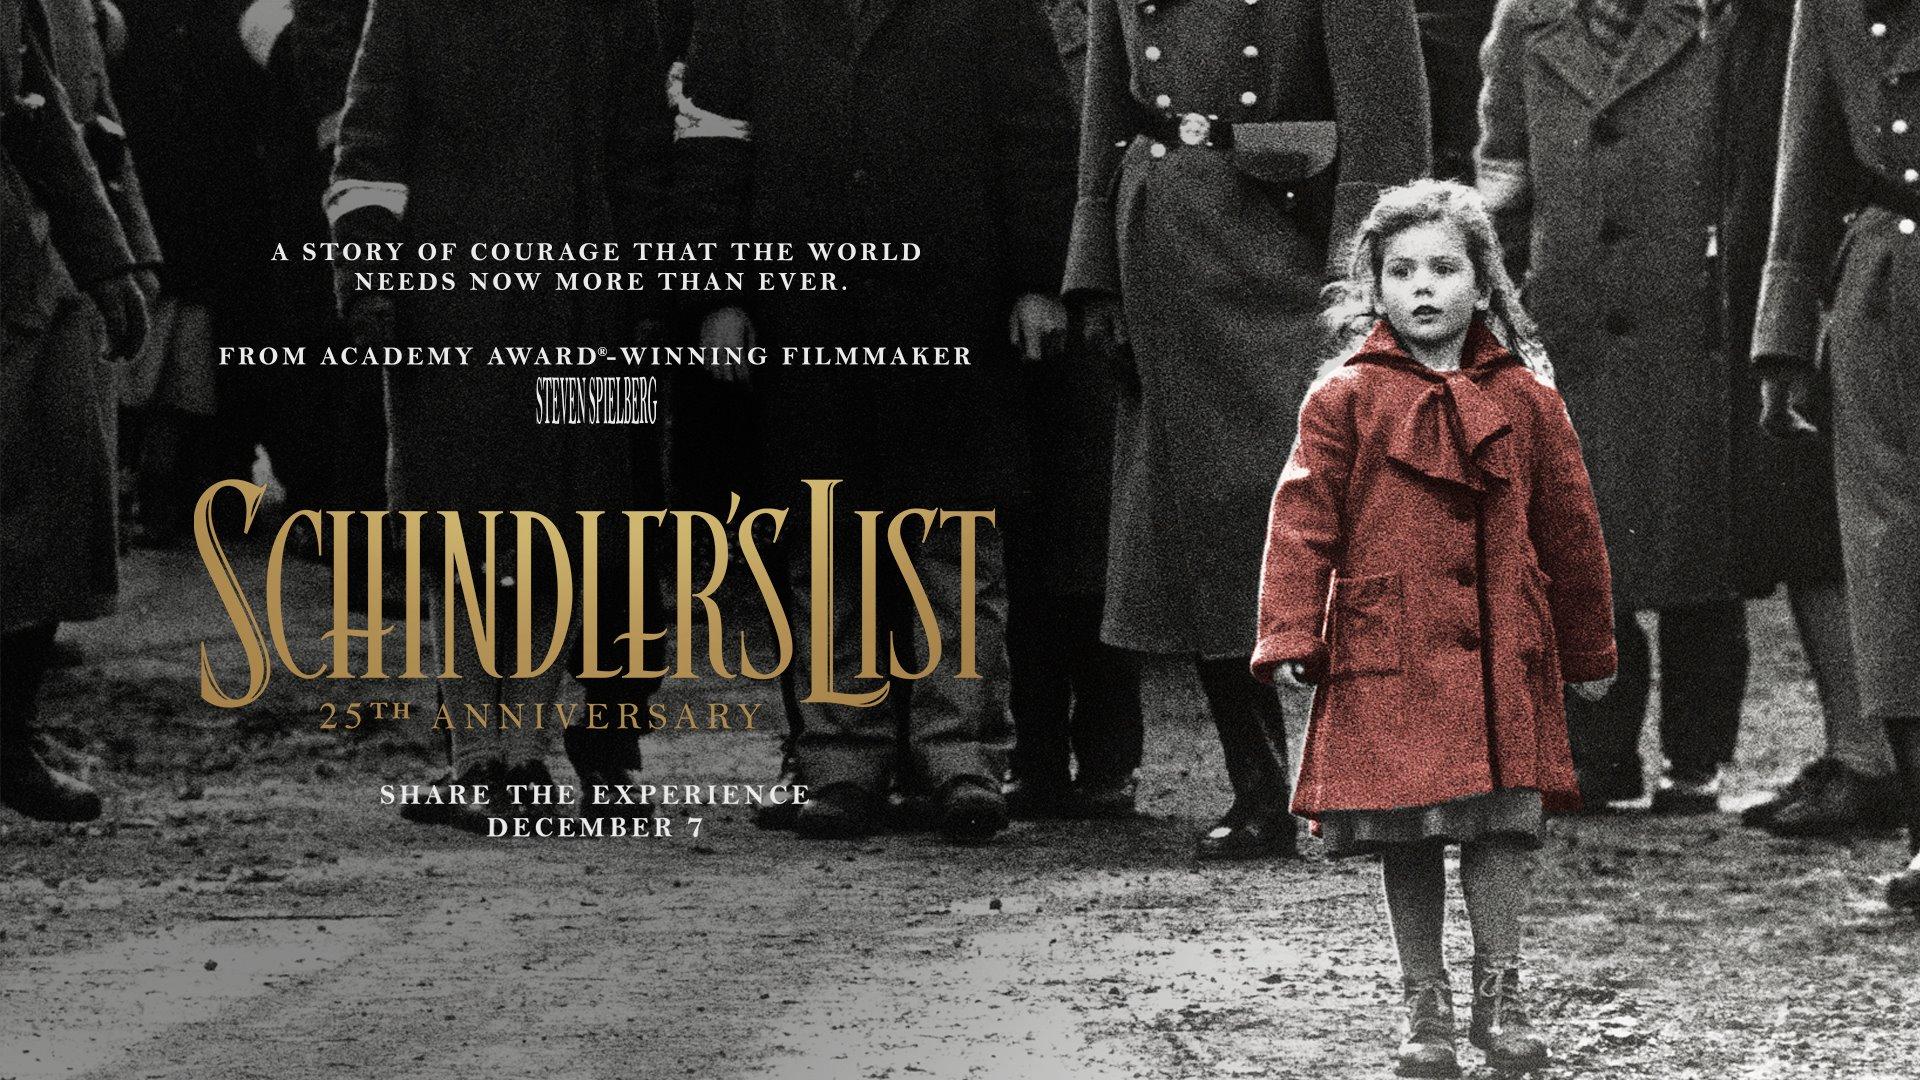 Schindlers Liste Fsk